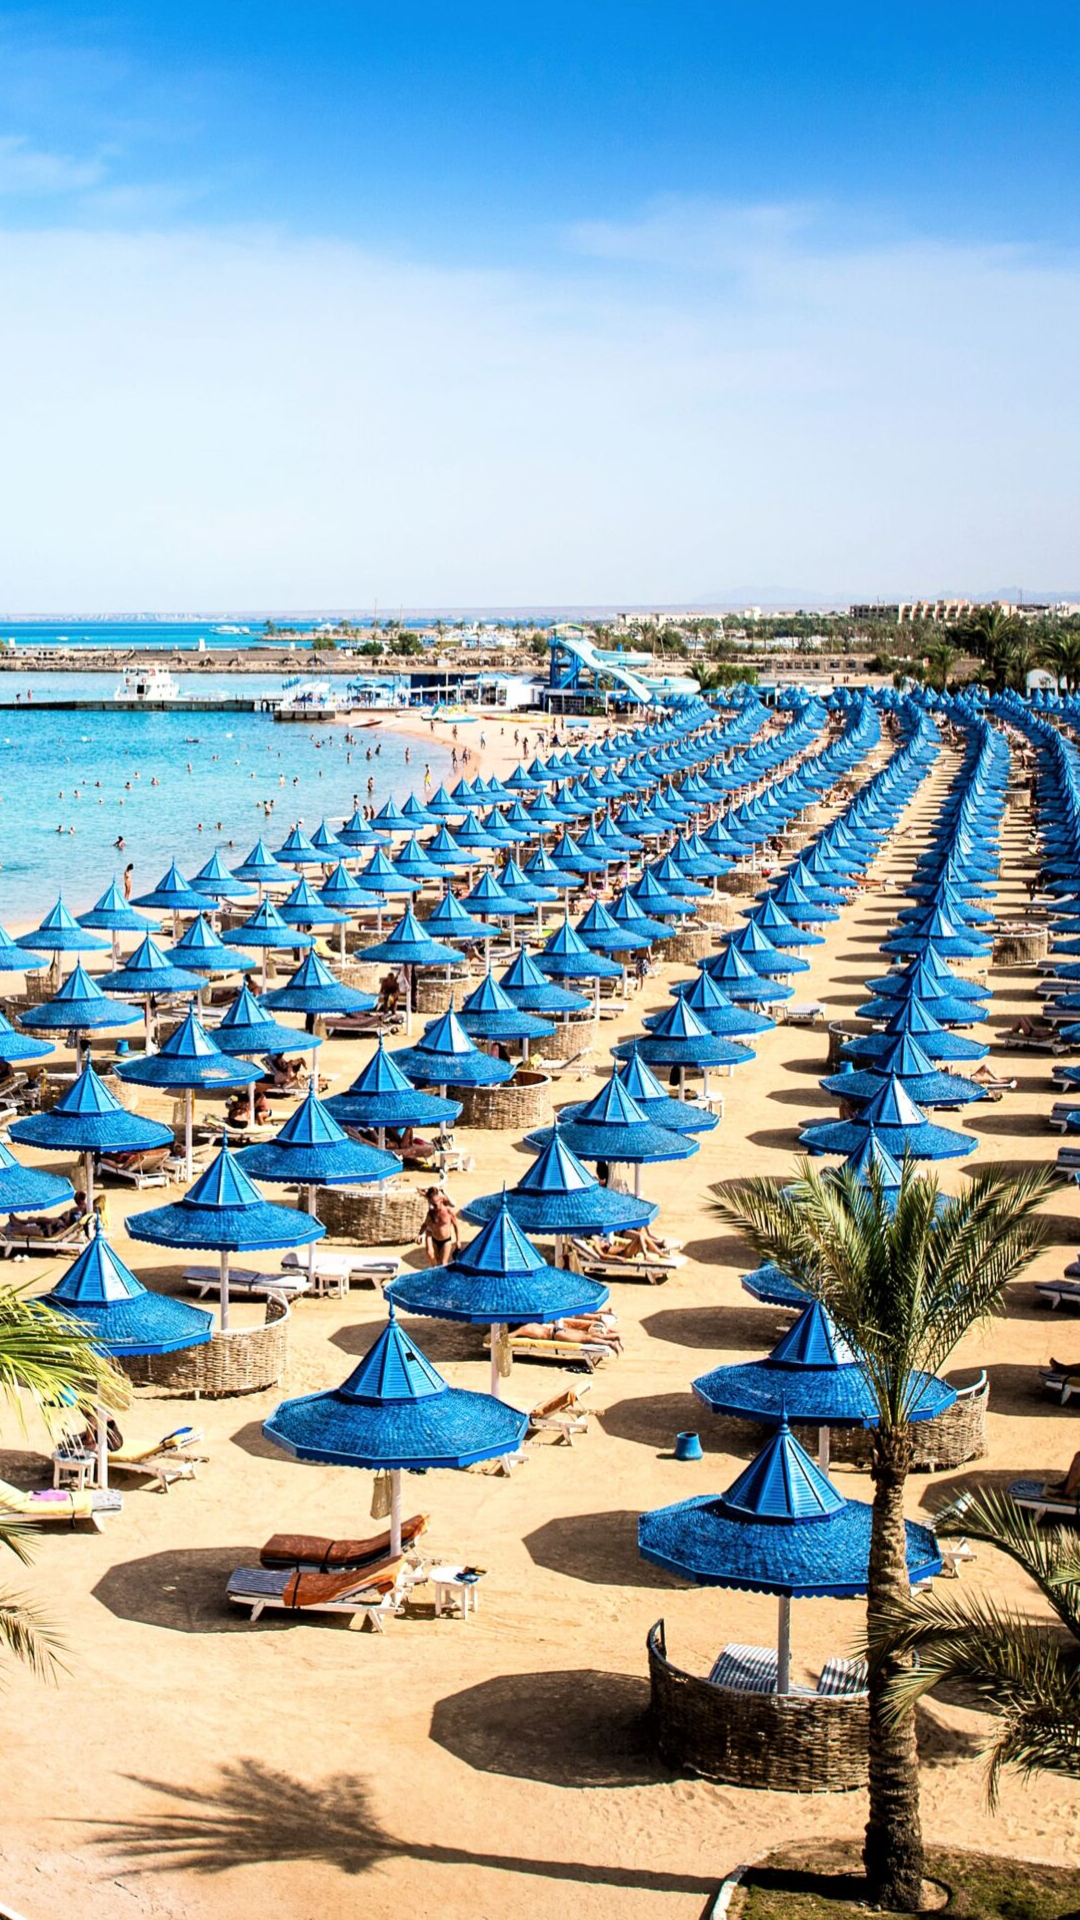 Traumstrand The Grand Hotel Hurghada In 2020 Hurghada Grand Hotel Hurghada Agypten Urlaub